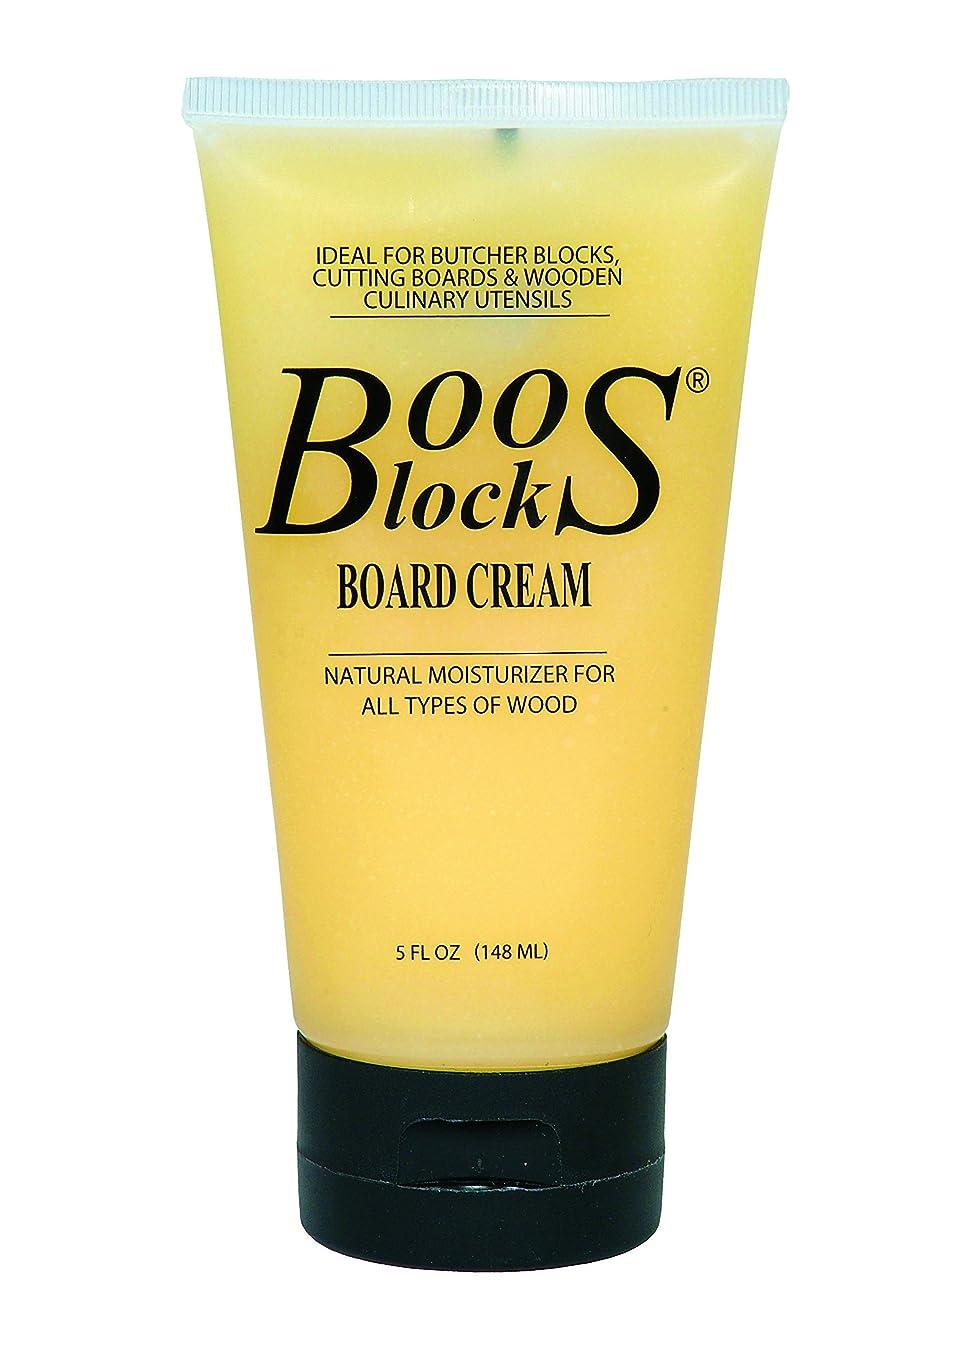 John Boos Block BWCB Butcher Block Board Cream, 5 ounce Tube